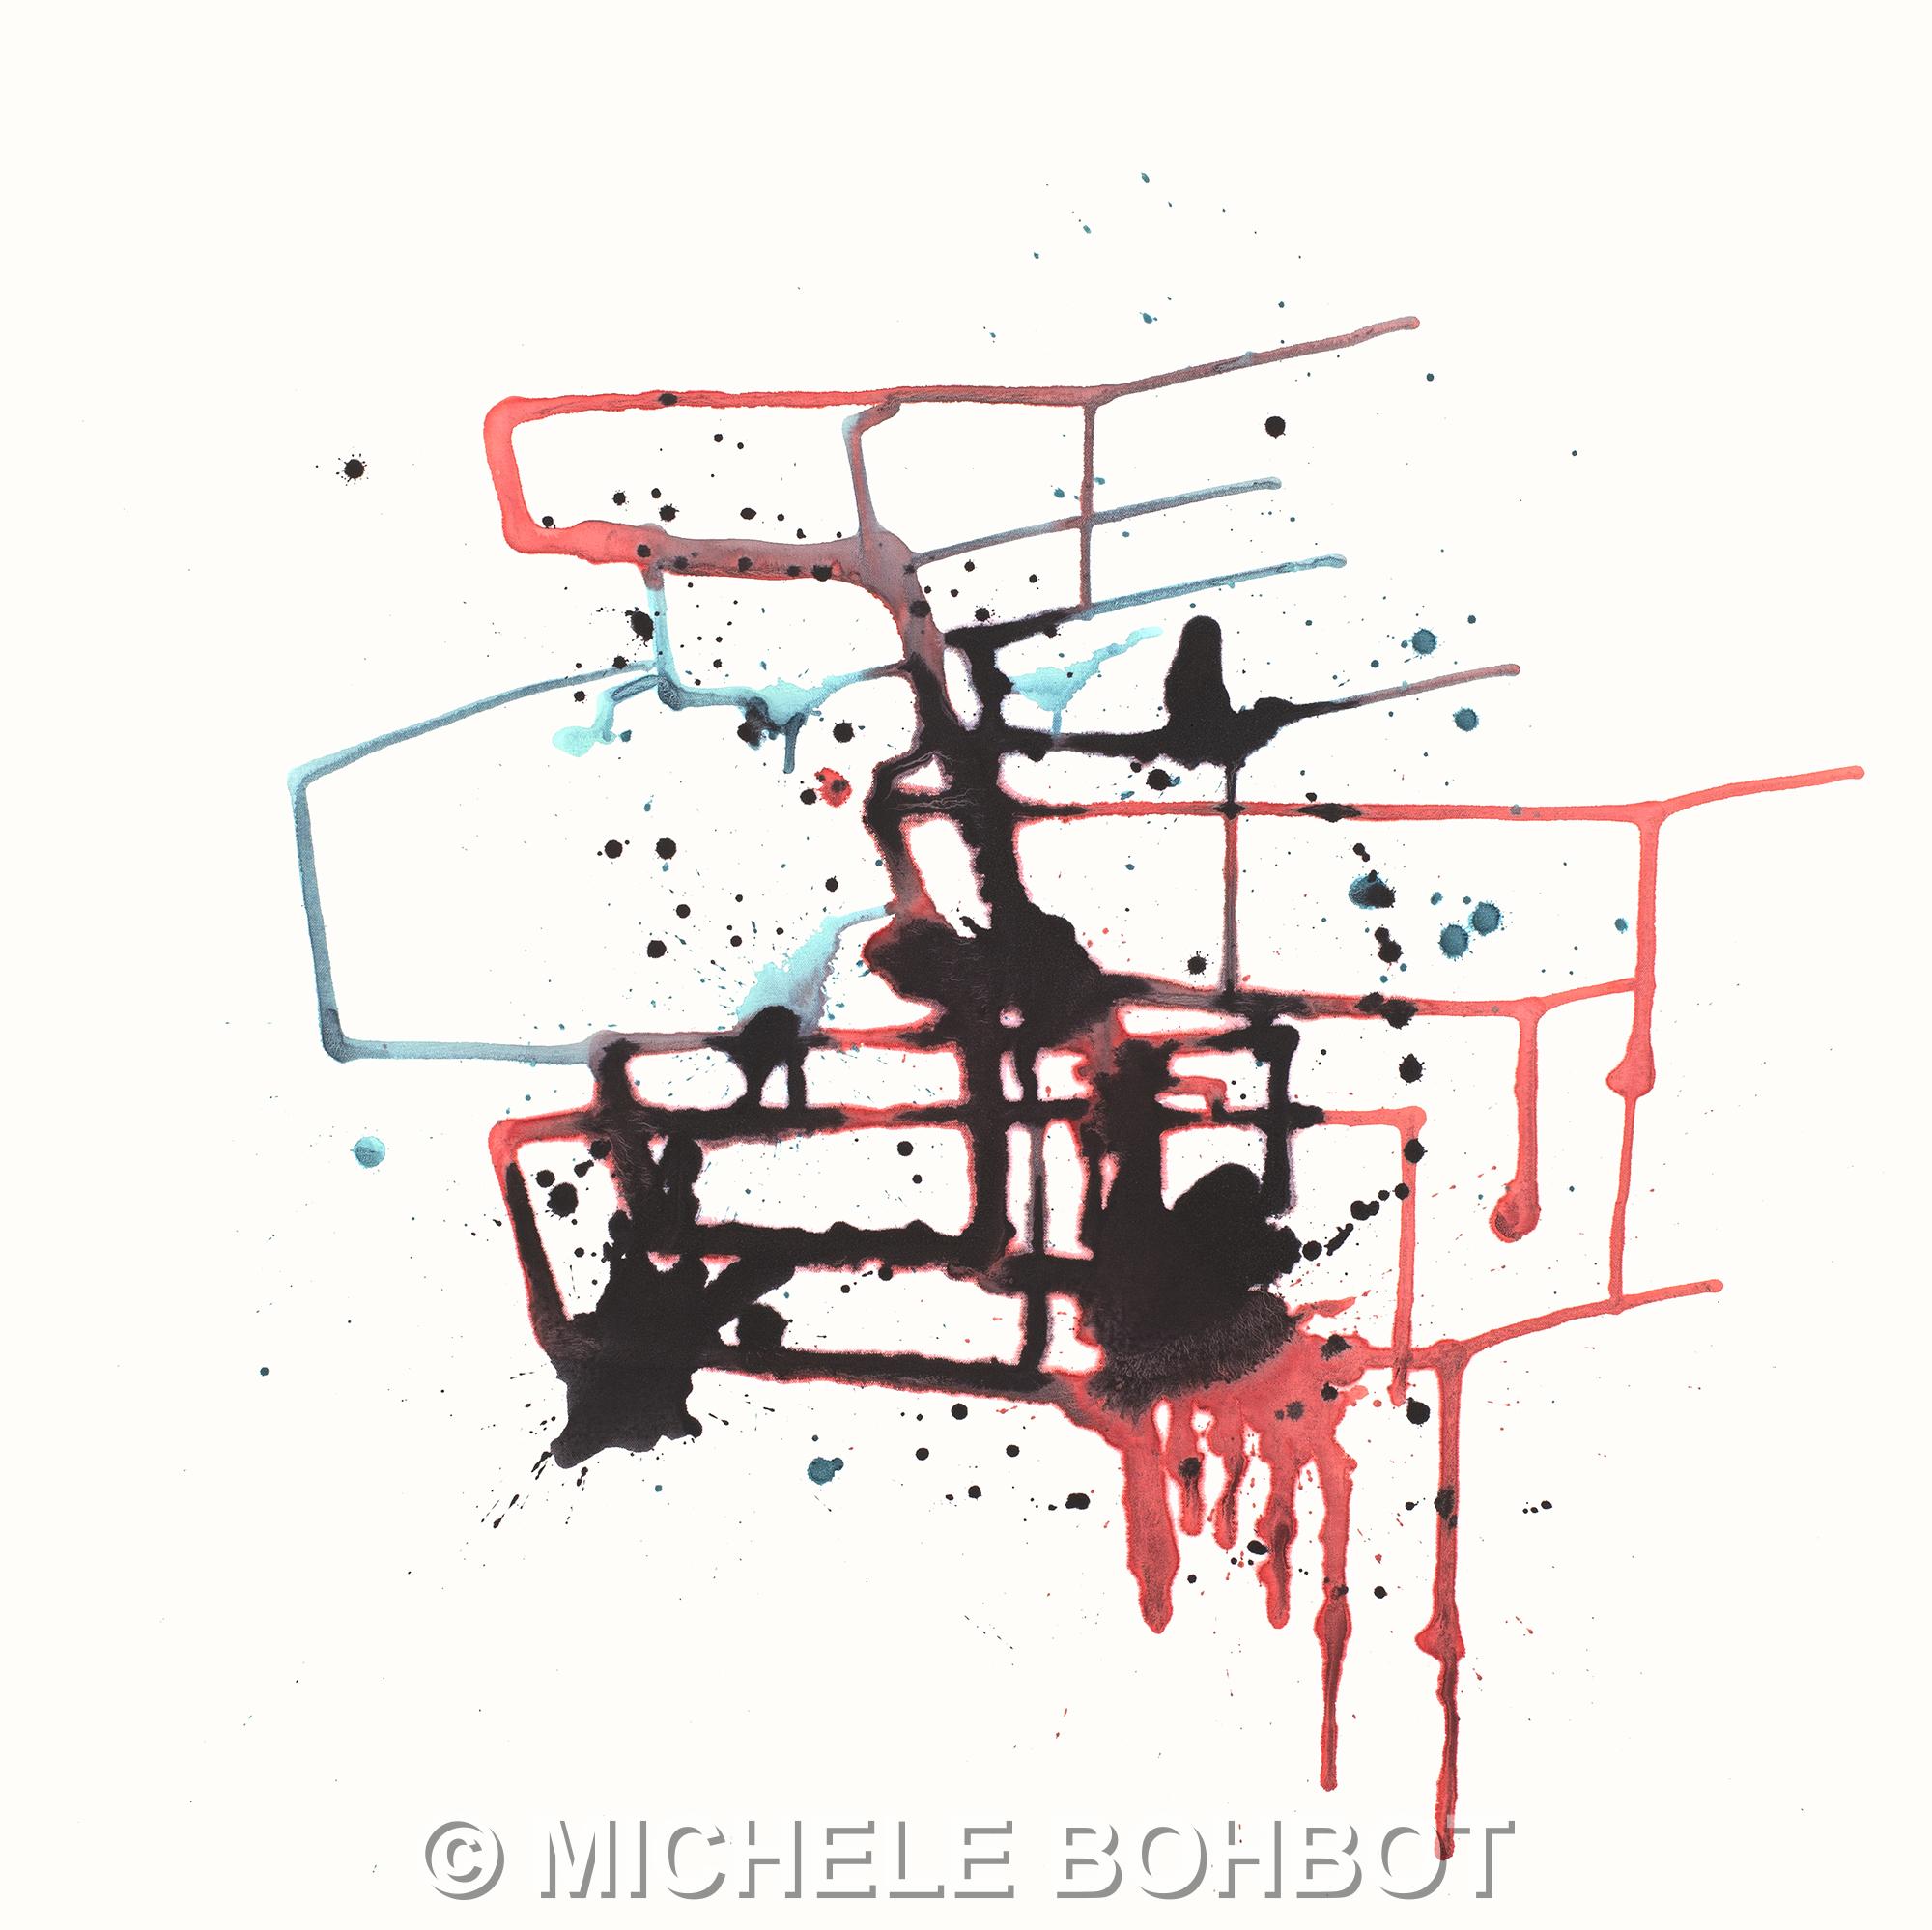 Michele A. Bohbot (4-13-19)_10_lg-1-1 copy.jpg